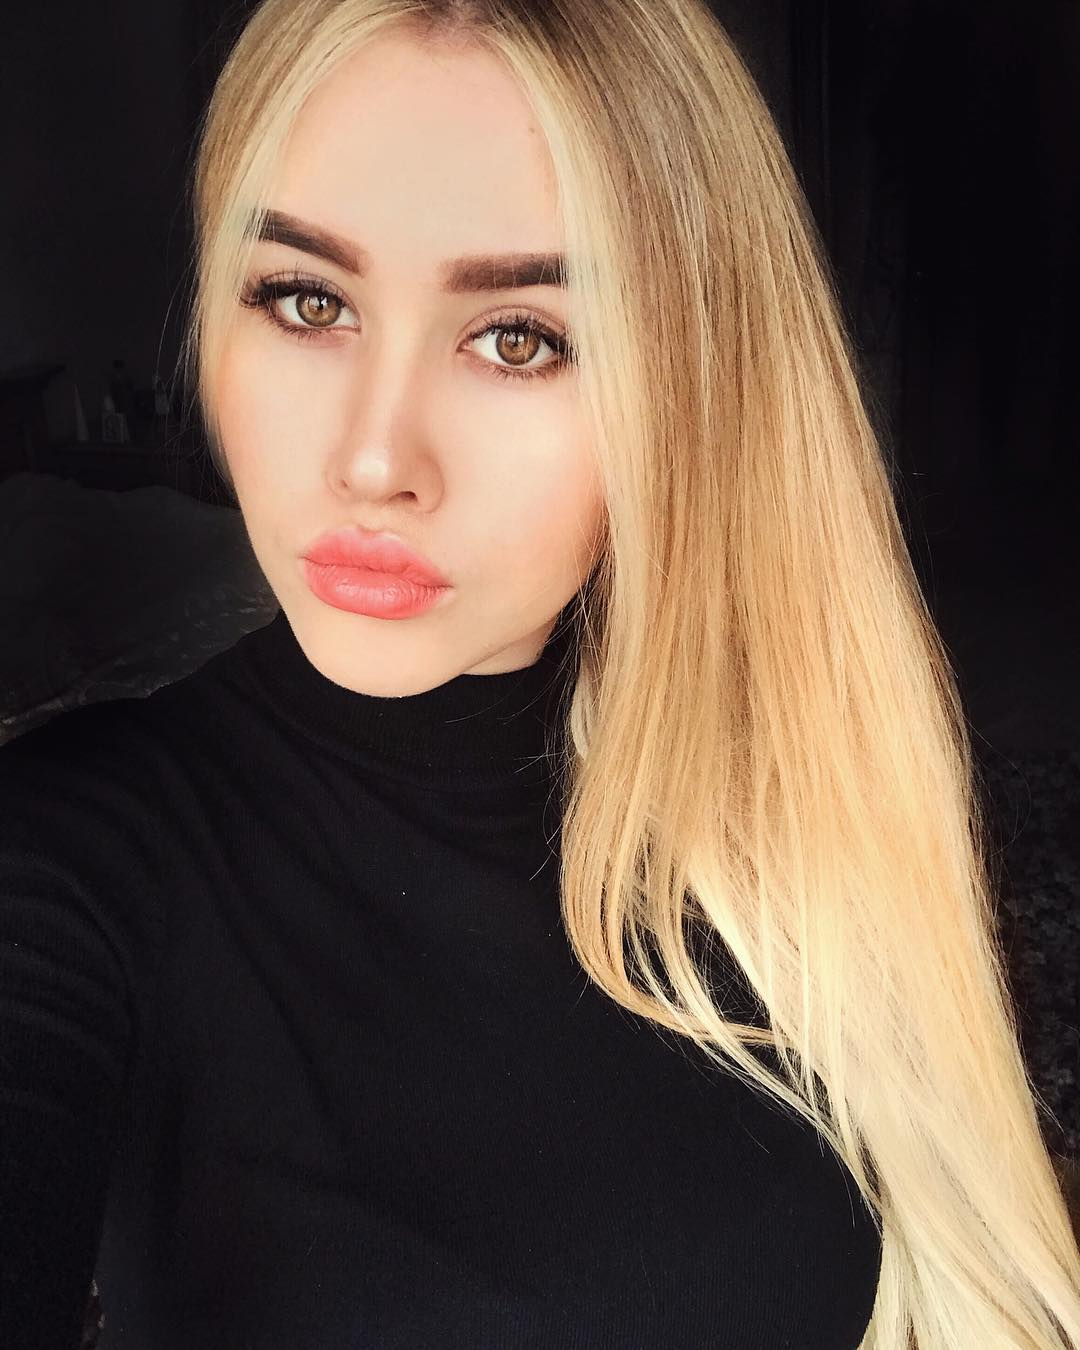 Liza-Dragun-Wallpapers-Insta-Fit-Bio-7